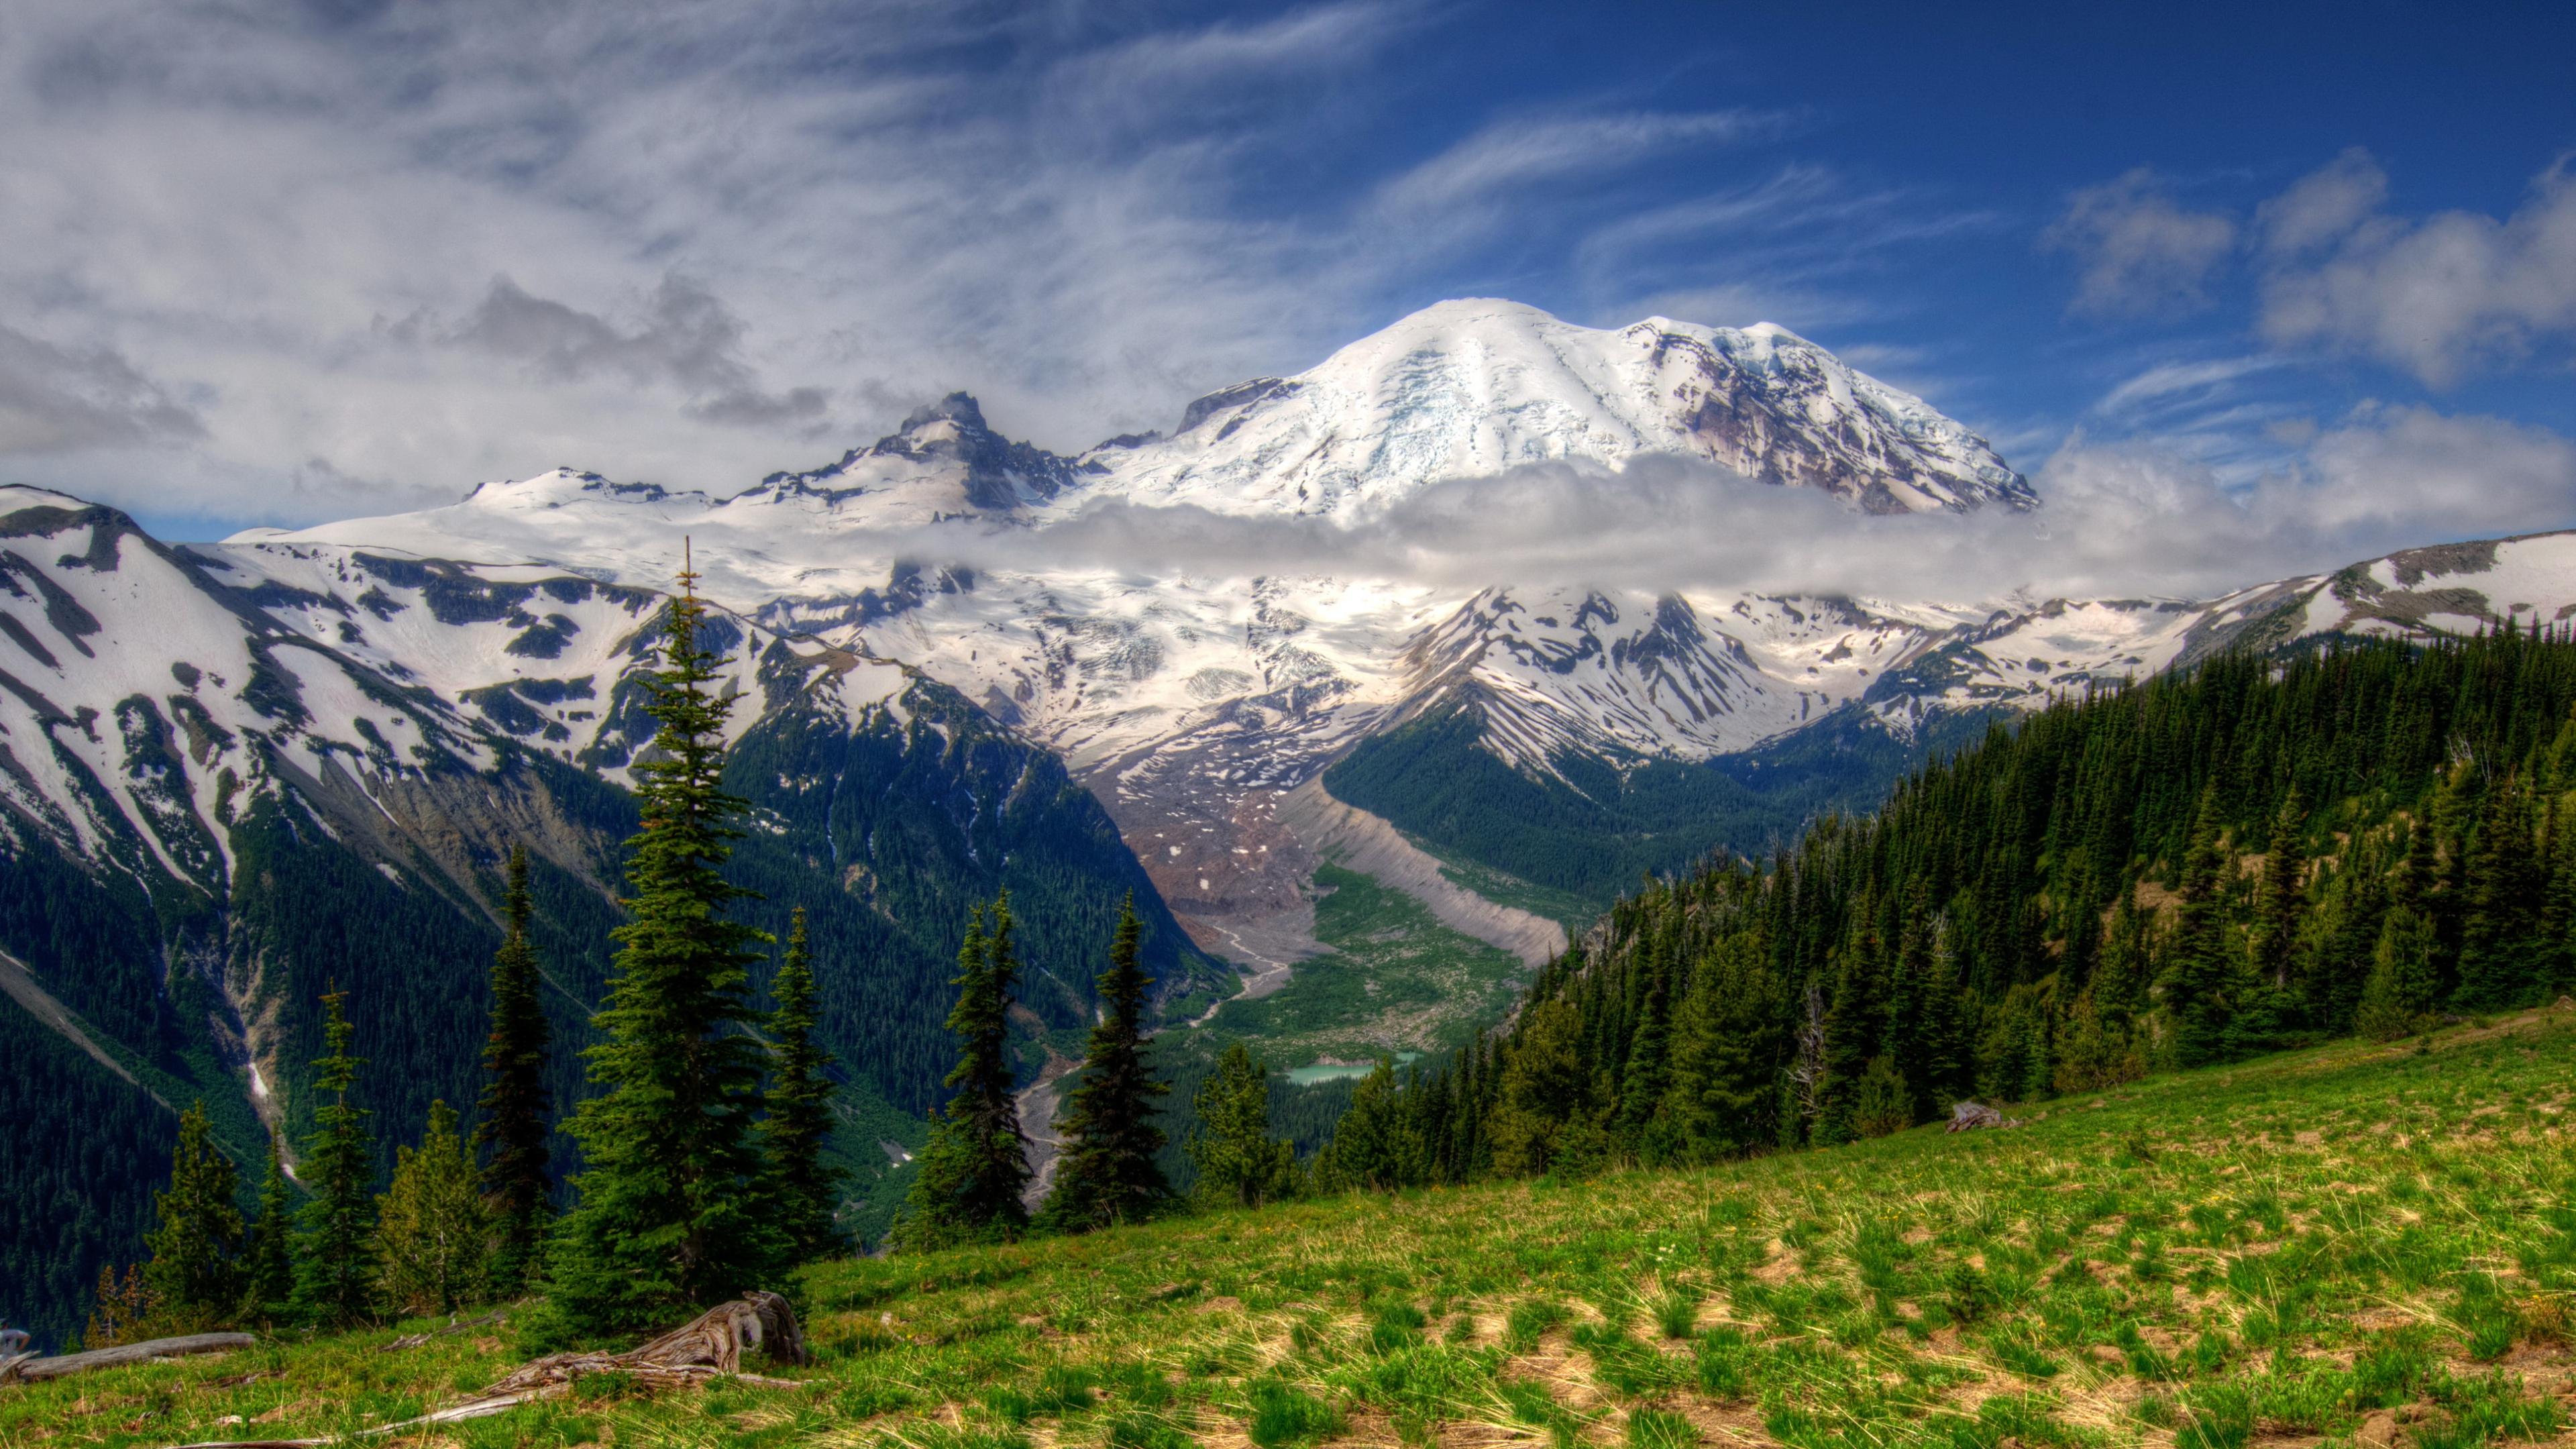 Mount Rainier Wallpapers HD 3840x2160